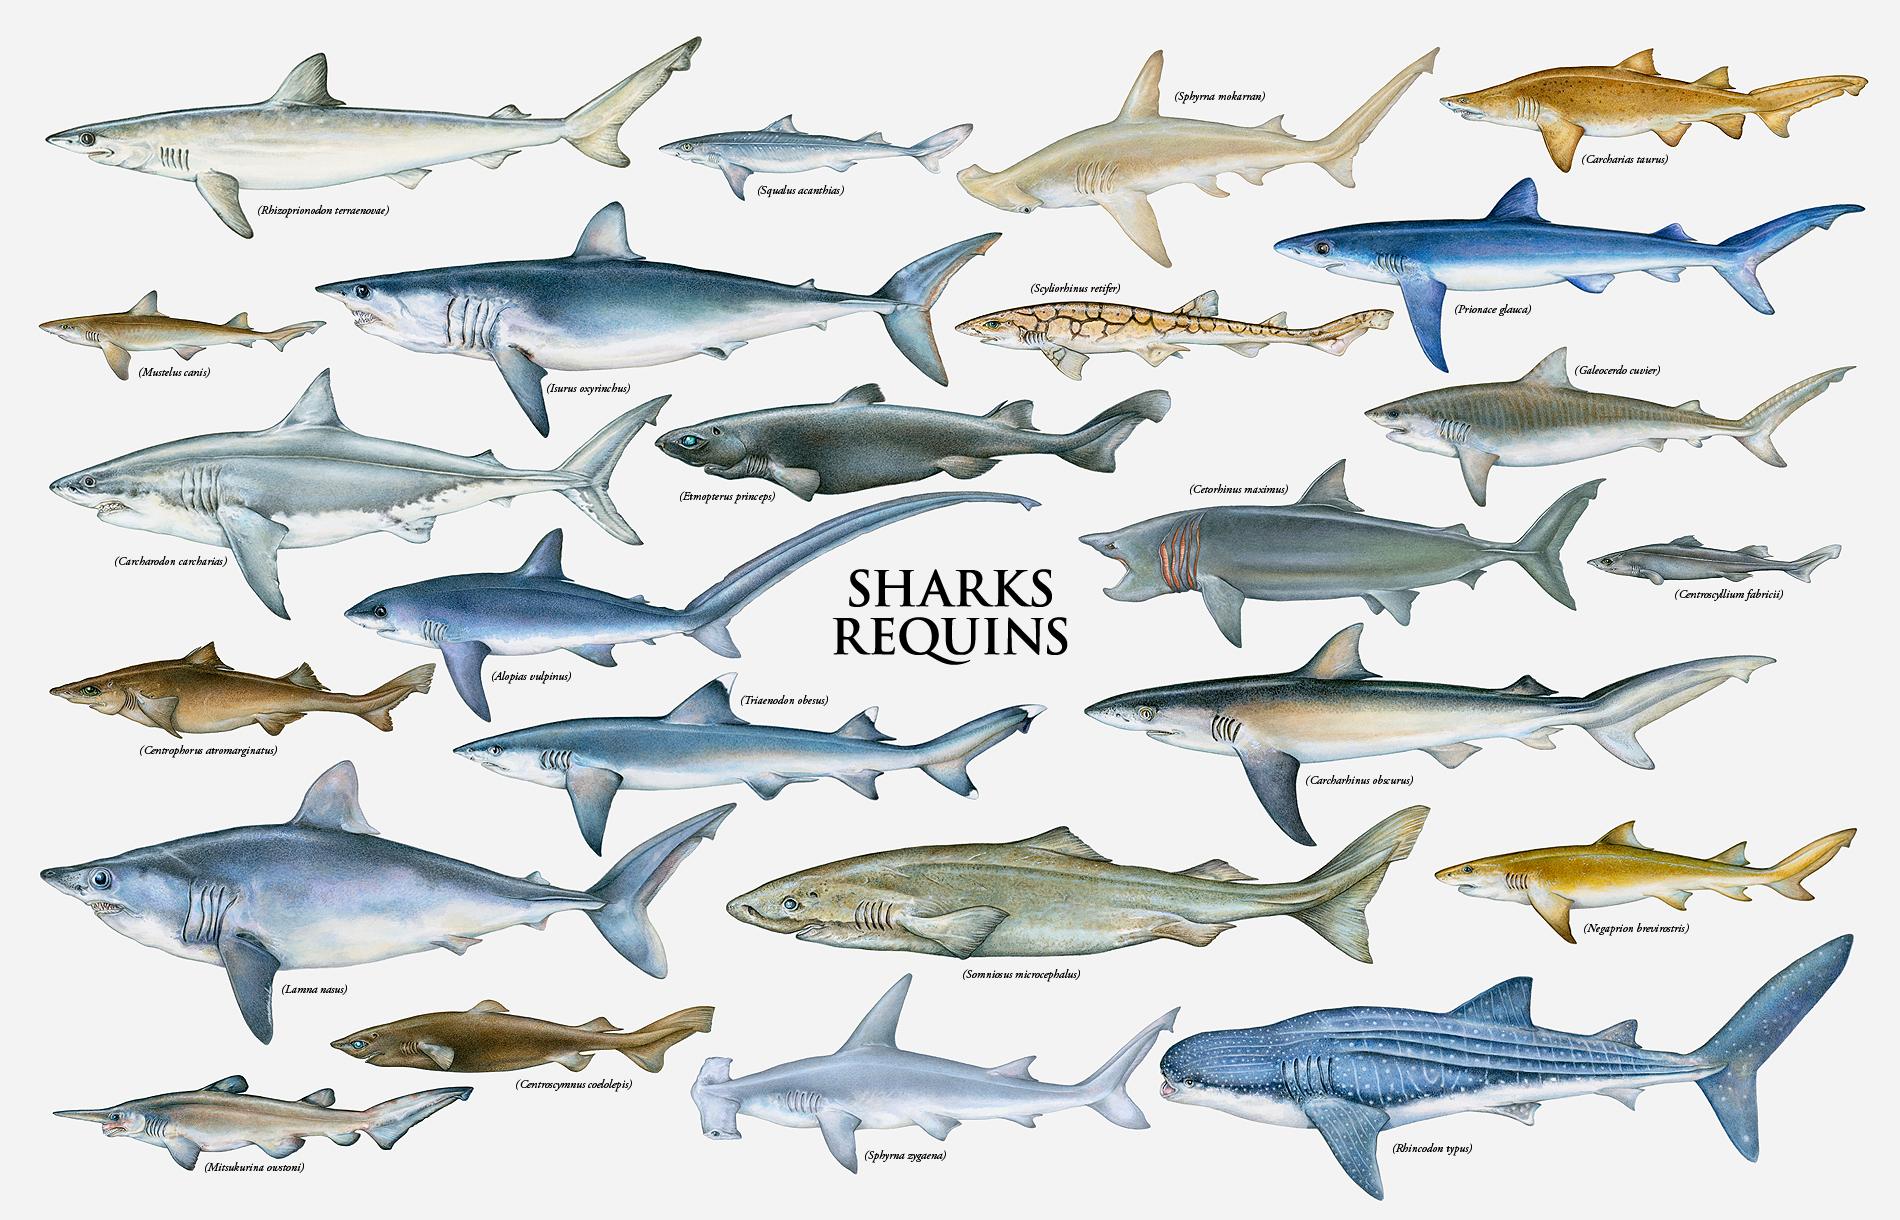 tiburones caribe - Buscar con Google   Tiburones   Pinterest ...